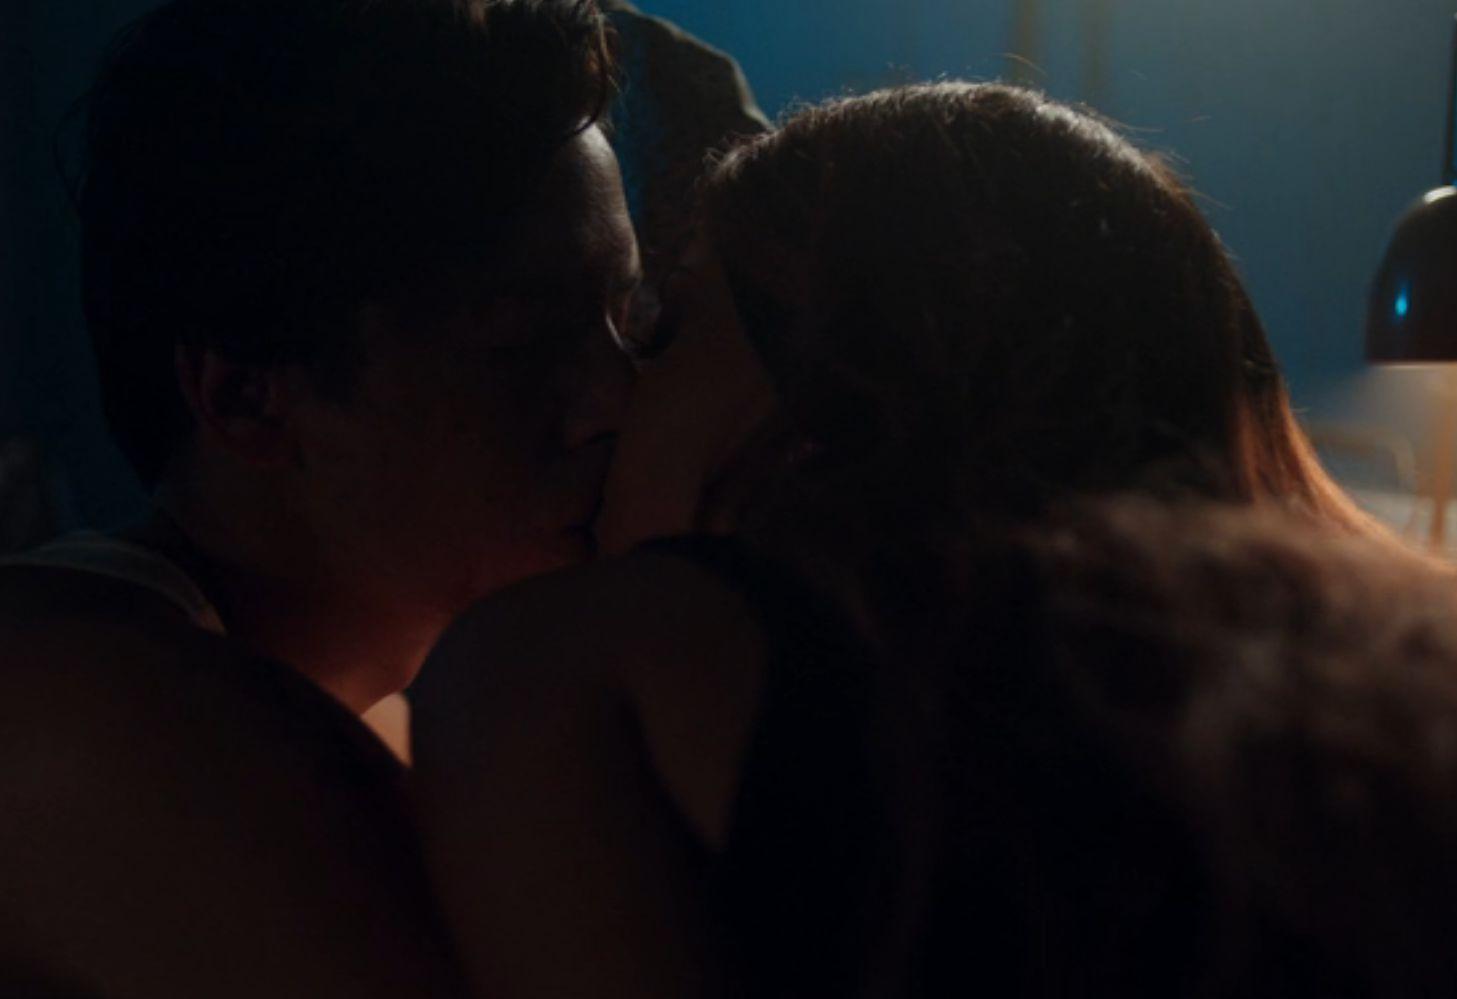 Toni and Jughead kissing (CW / Riverdale)